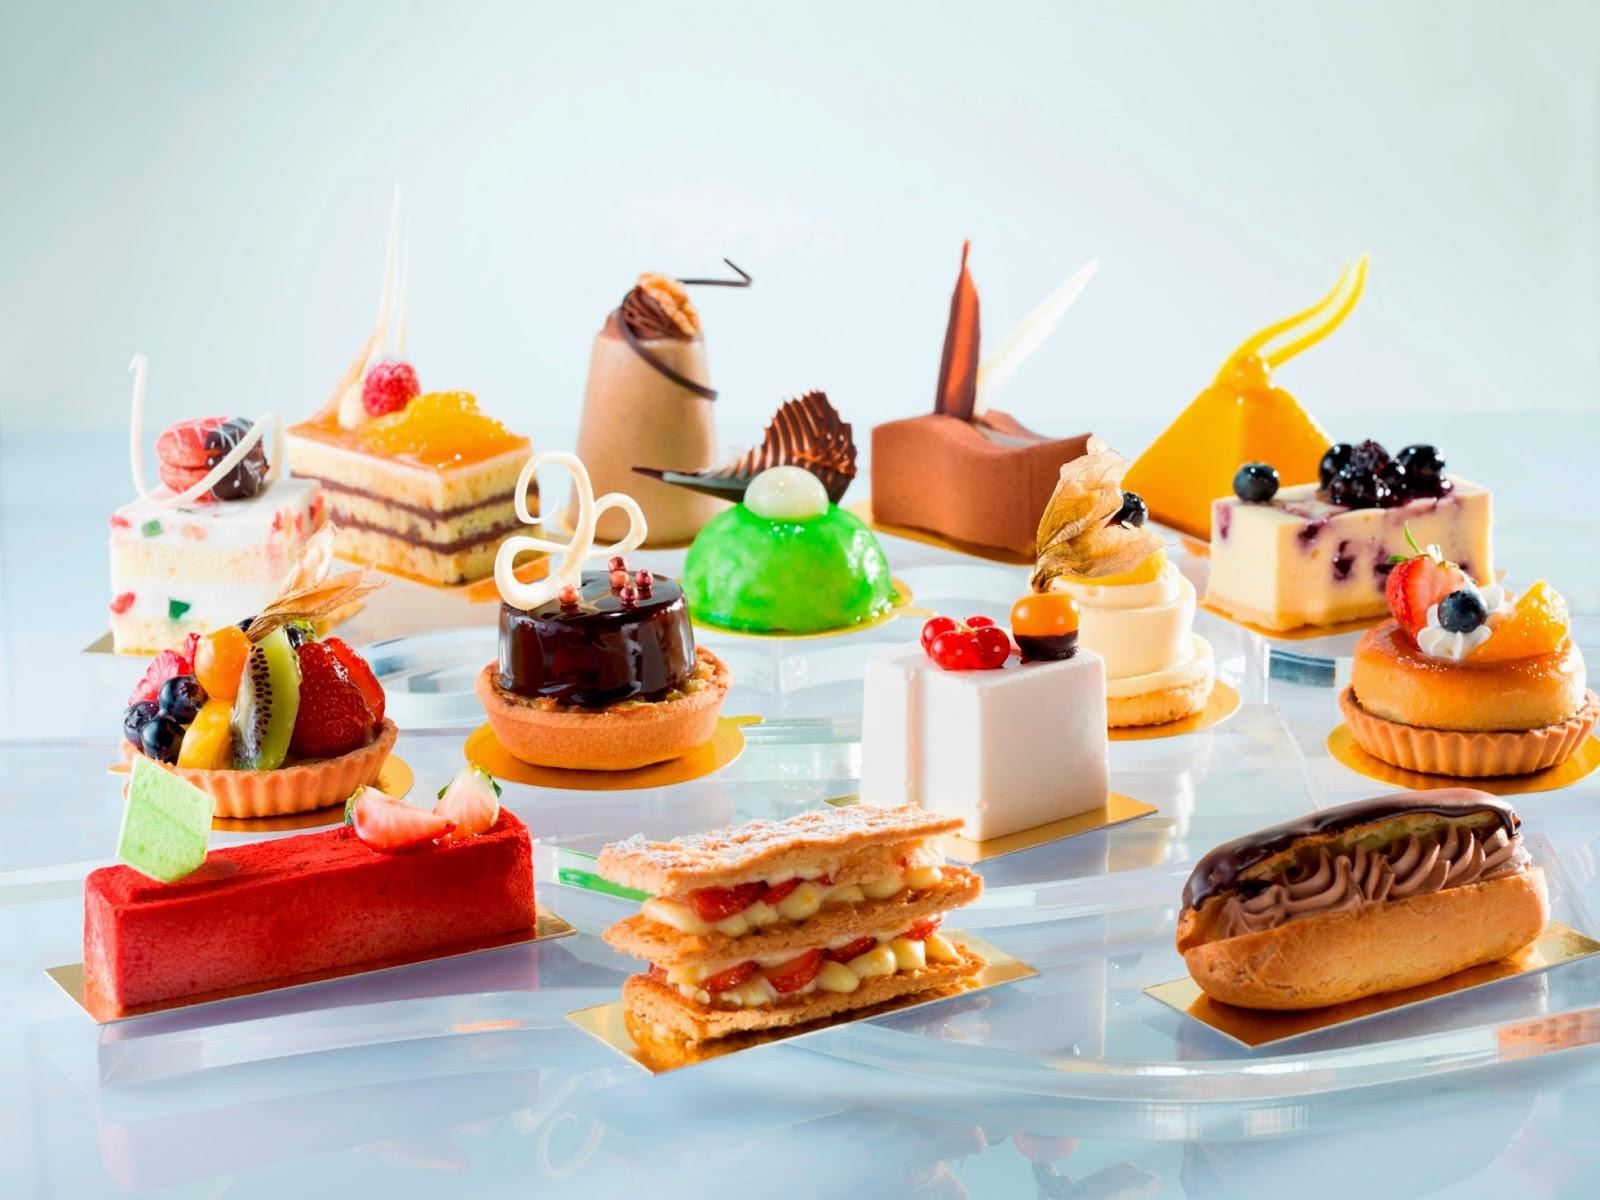 EventMO: 精緻餅店「甜點」於澳門金沙開業 各款滋味蛋糕及烘焙美點應有盡有 / Exquisite Cake Shop SweetSpot Opens at ...